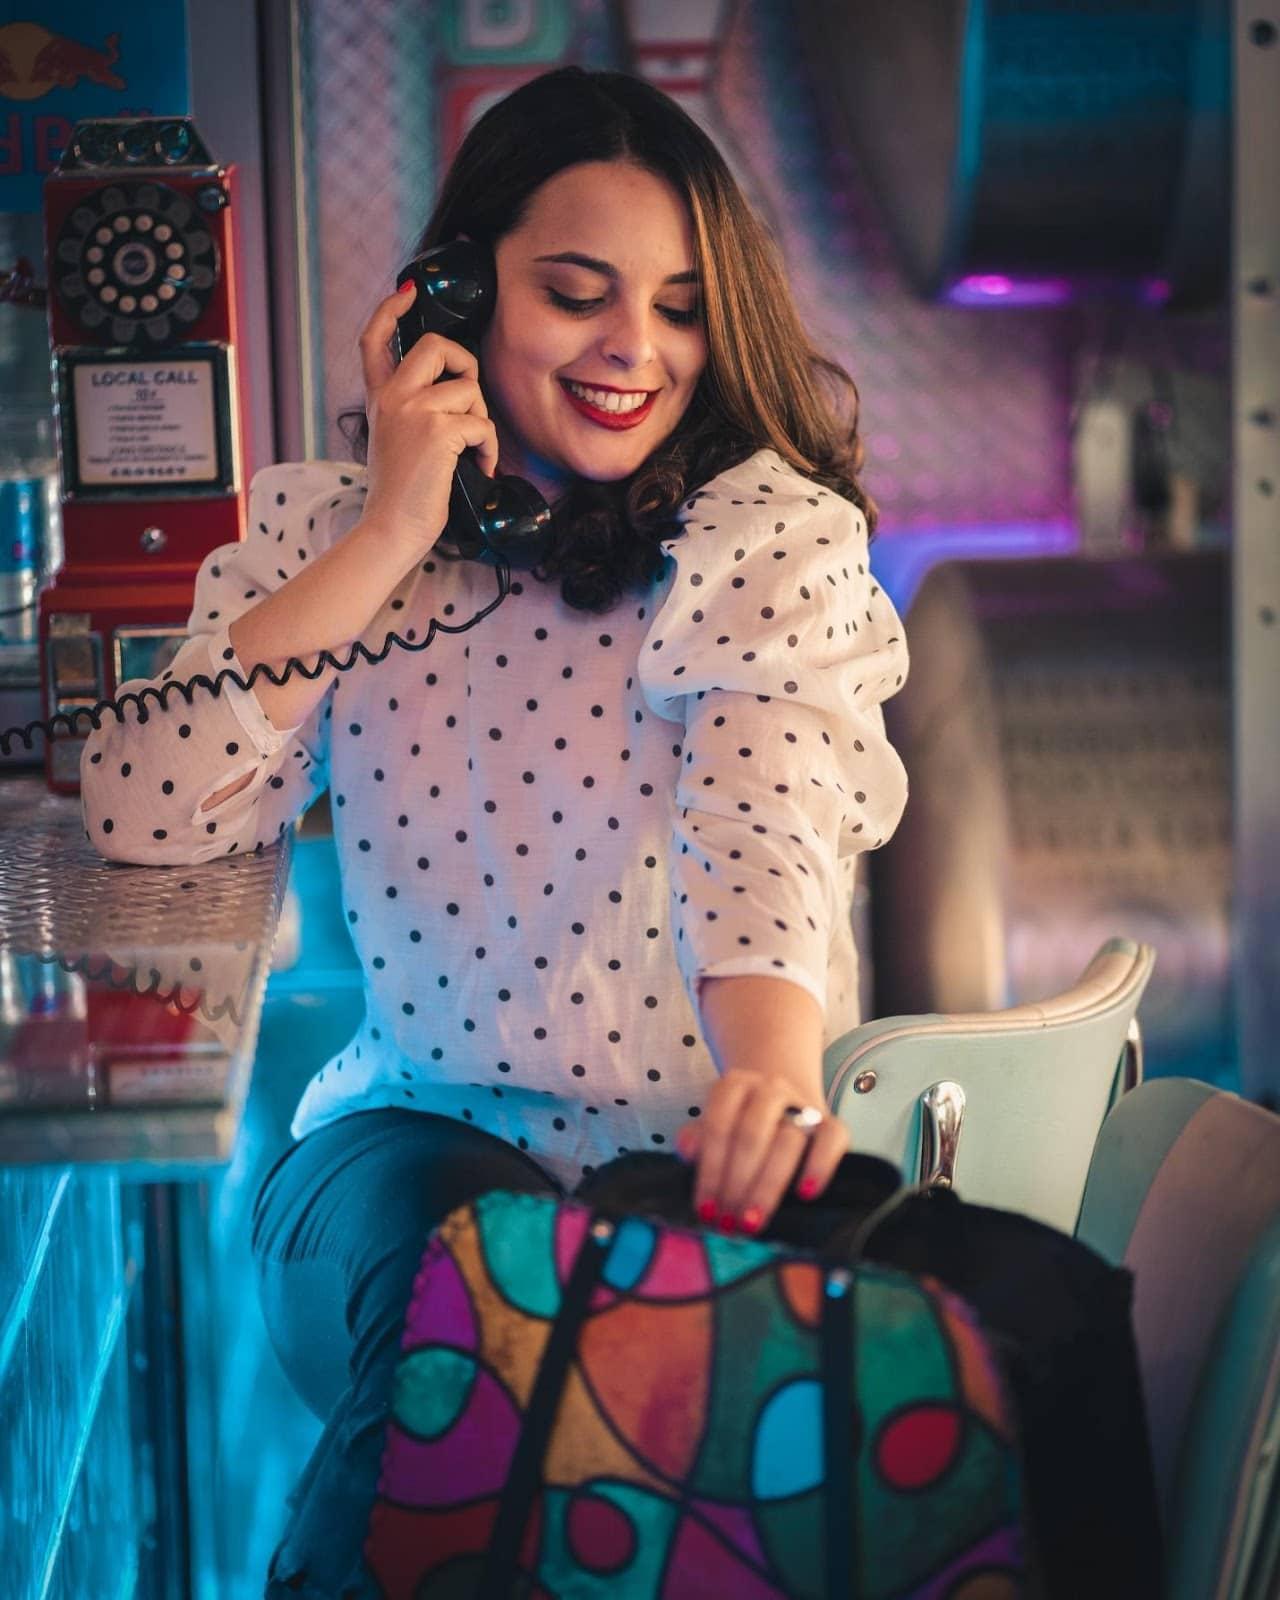 retro woman talking on a landline phone